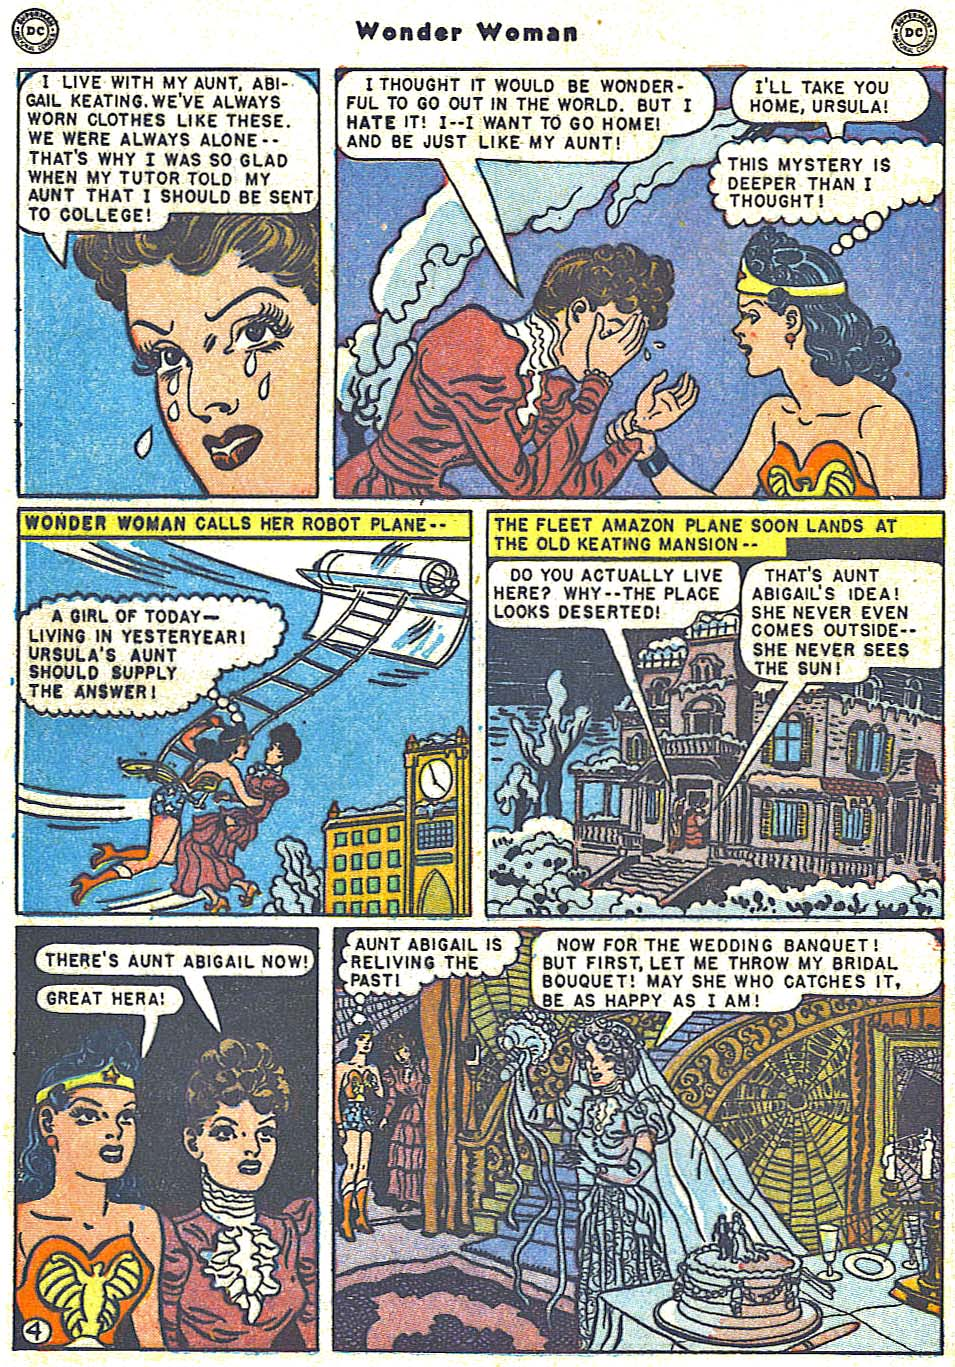 Read online Wonder Woman (1942) comic -  Issue #38 - 6